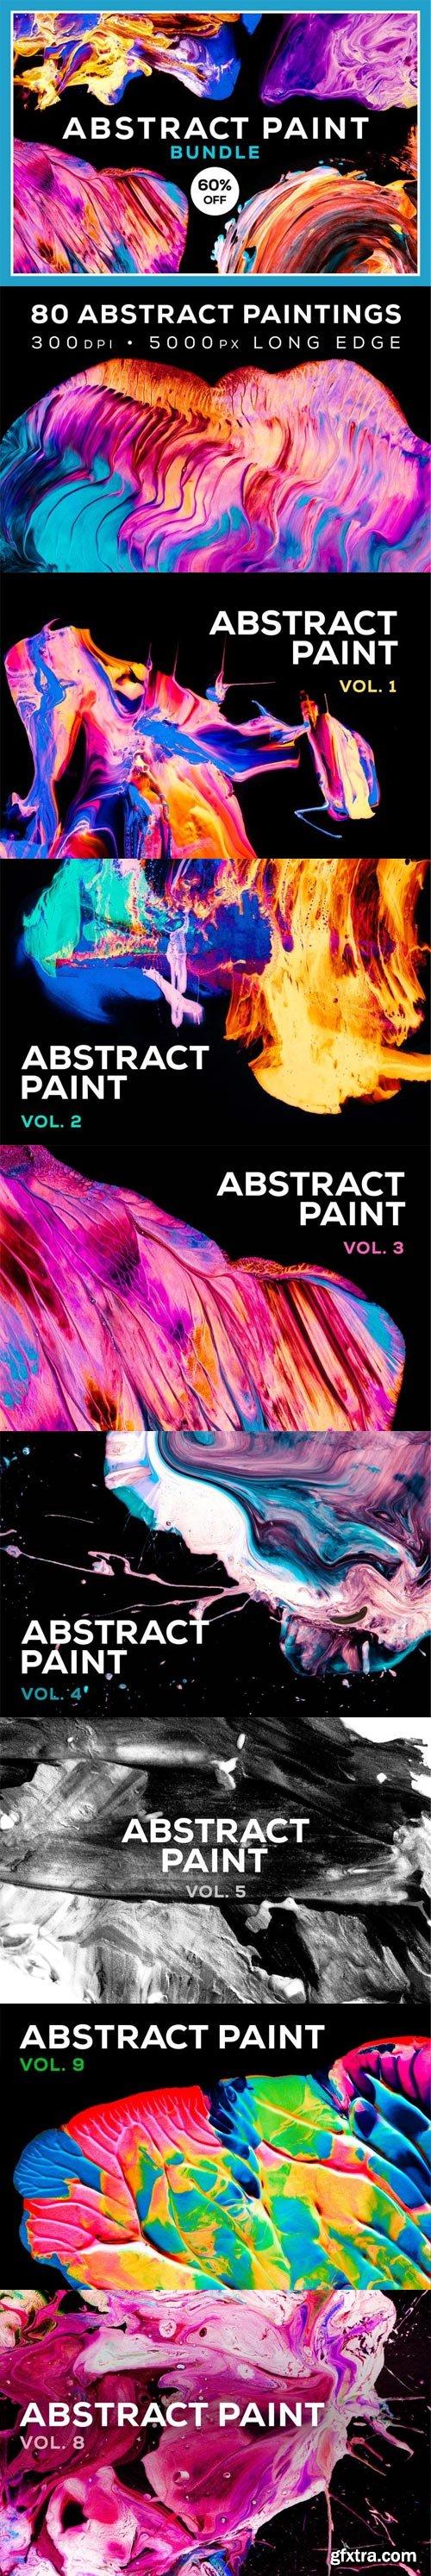 ChromaSupply - Abstract Paint Bundle